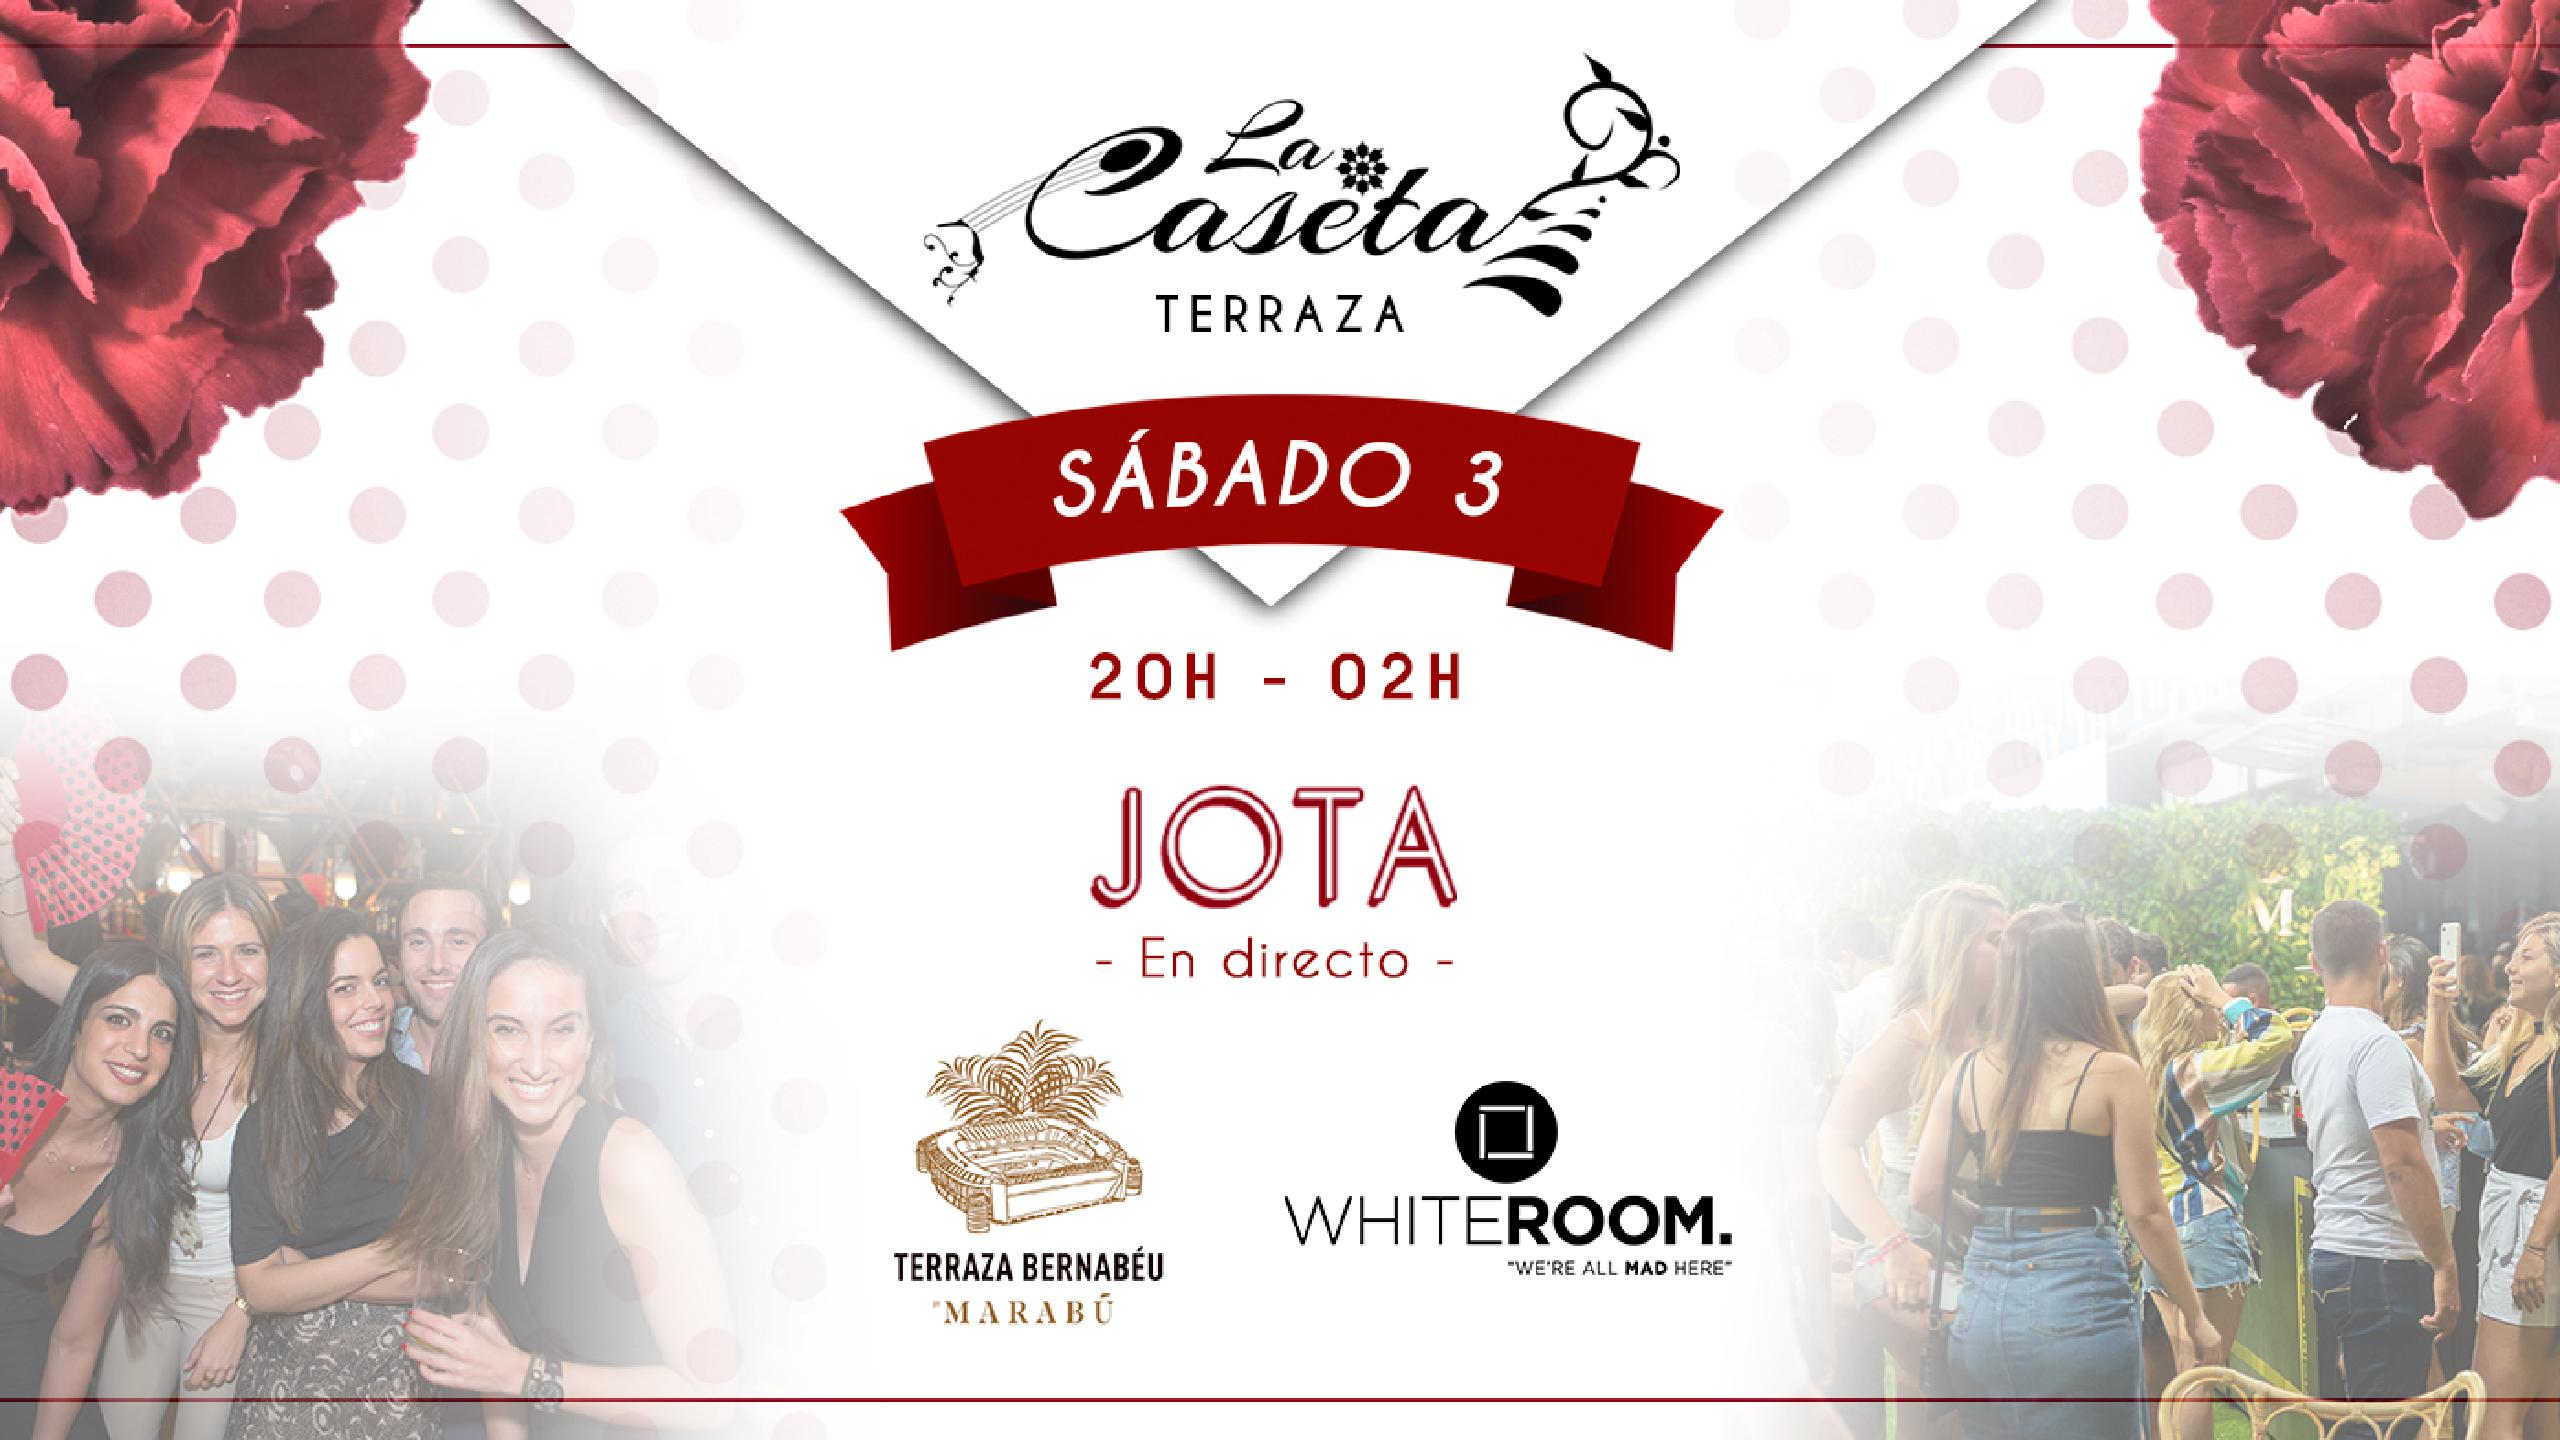 Concert Tickets For Terraza Bernabeu By Marabú Madrid